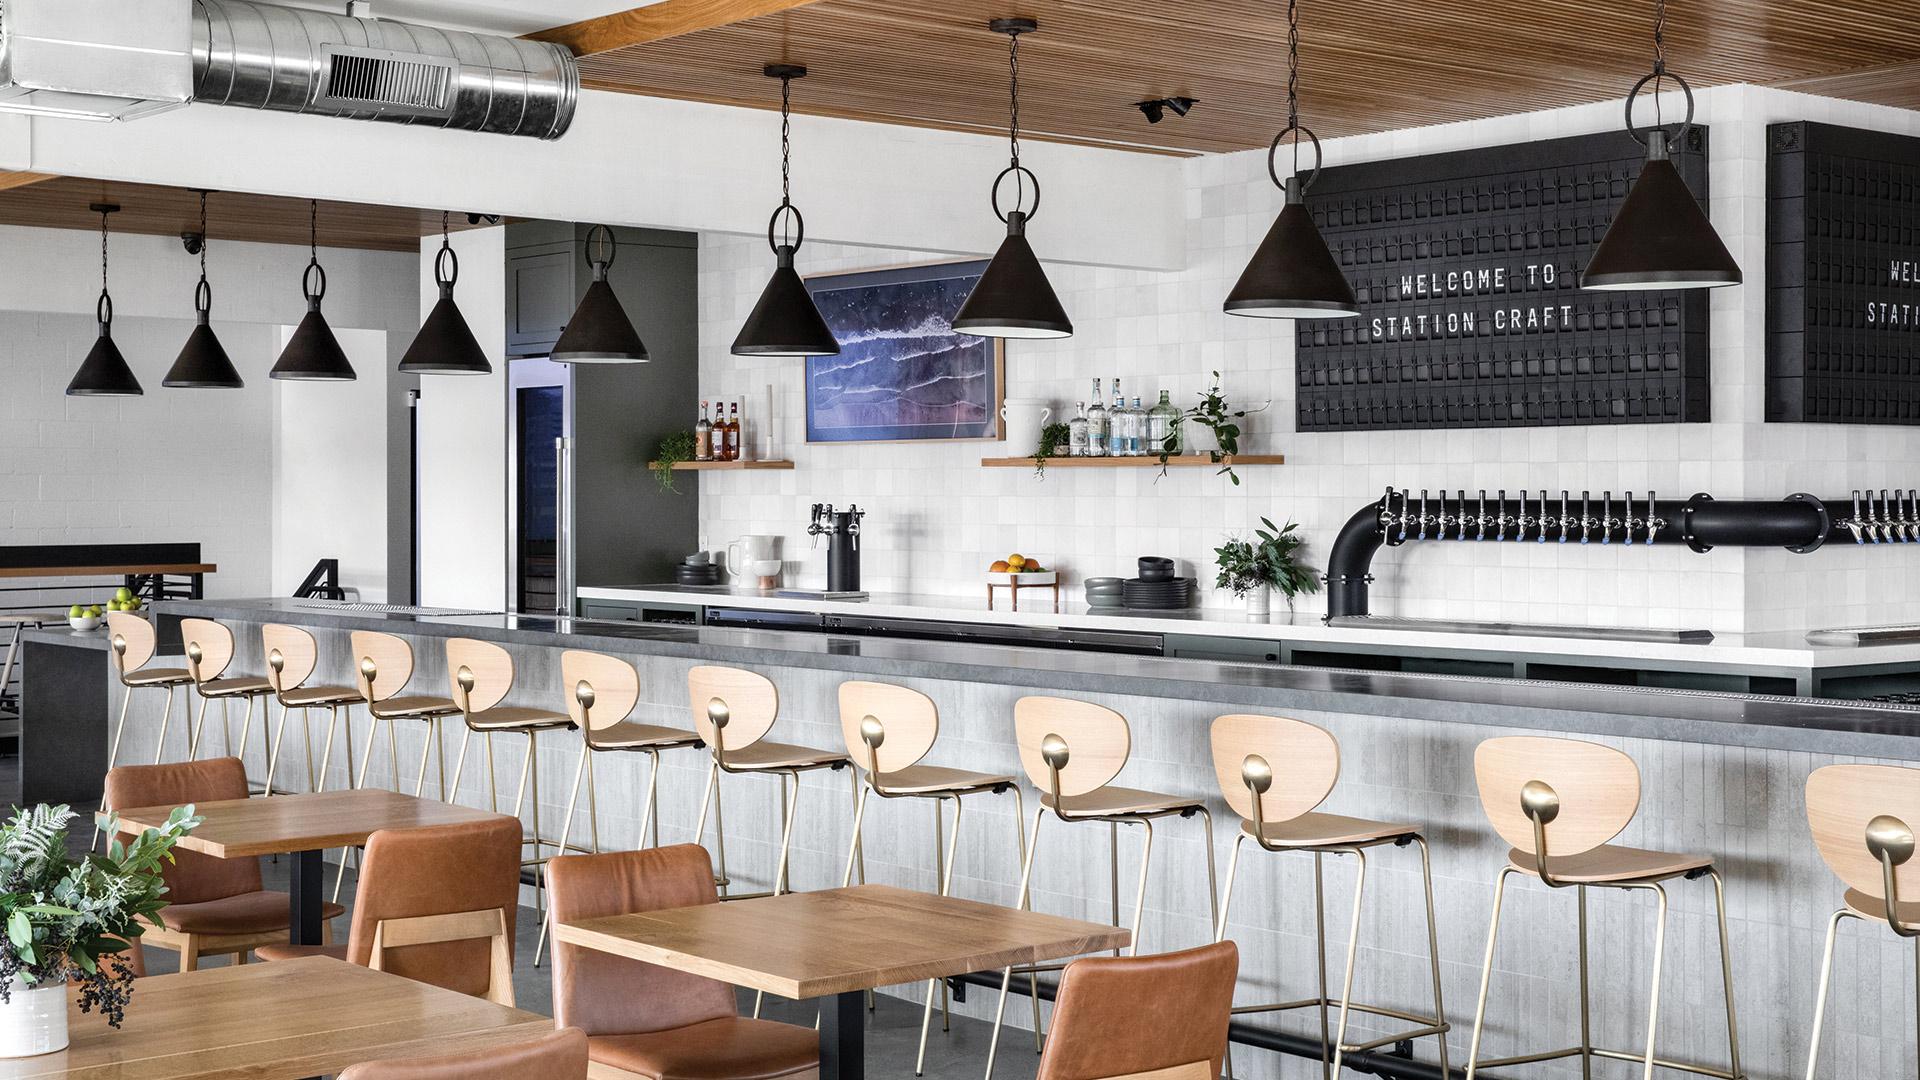 Station Craft Dana Point Interior Design Lindye Galloway - Unsung Studio Branding